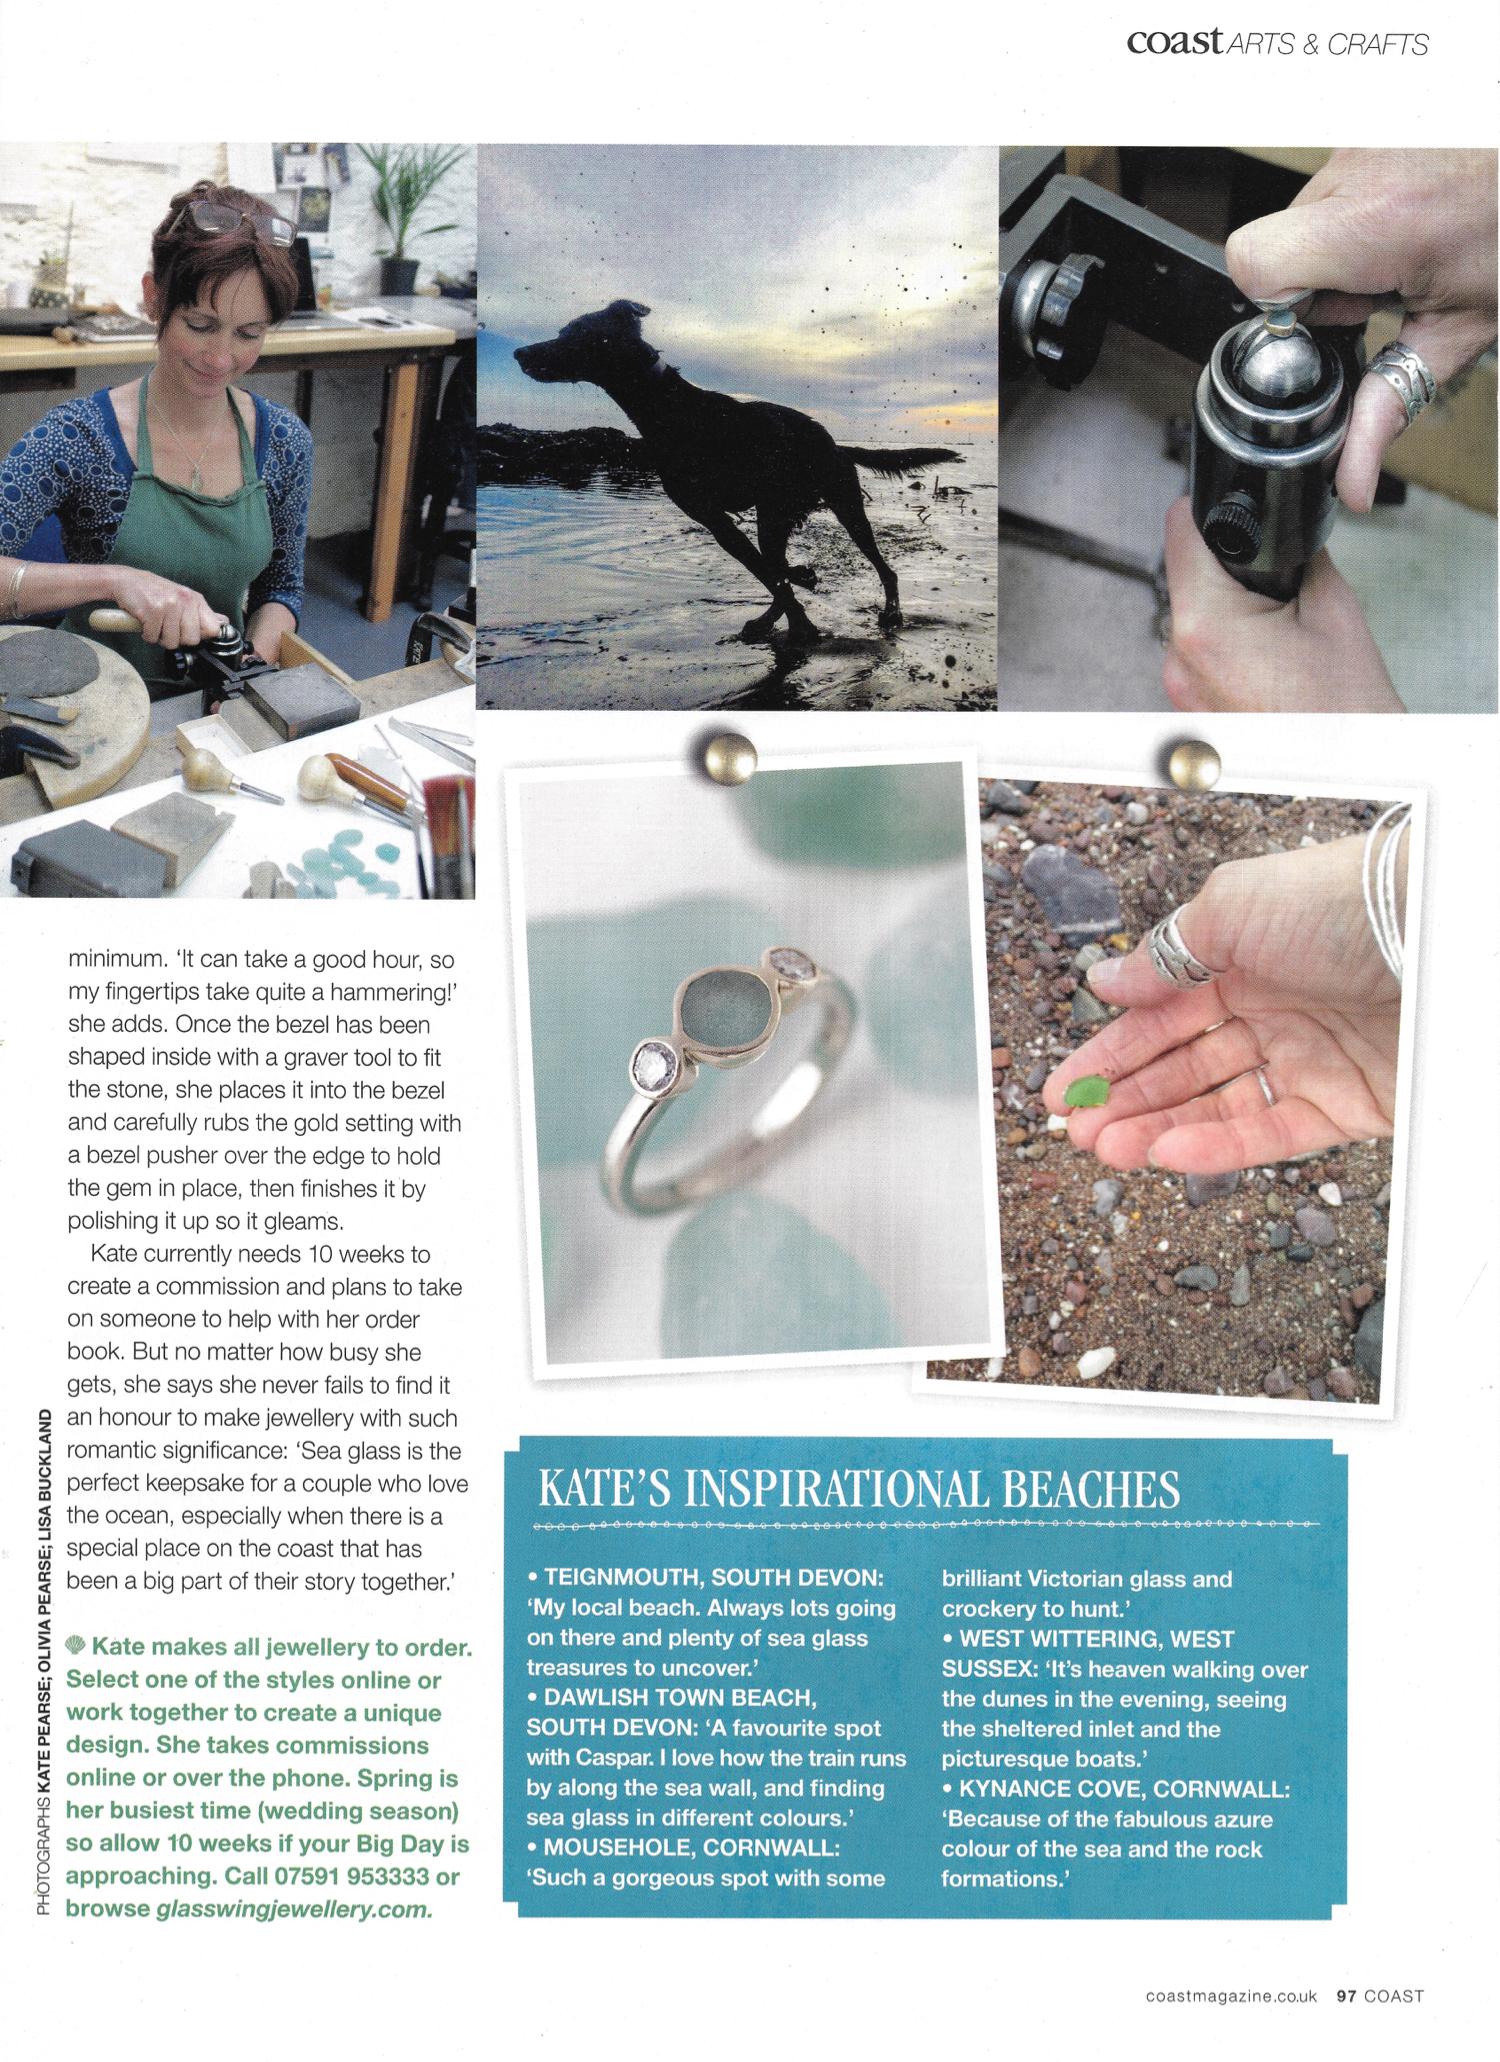 Glasswing-jewellery-coast-magazone-article-Feb-2018 (1).jpg